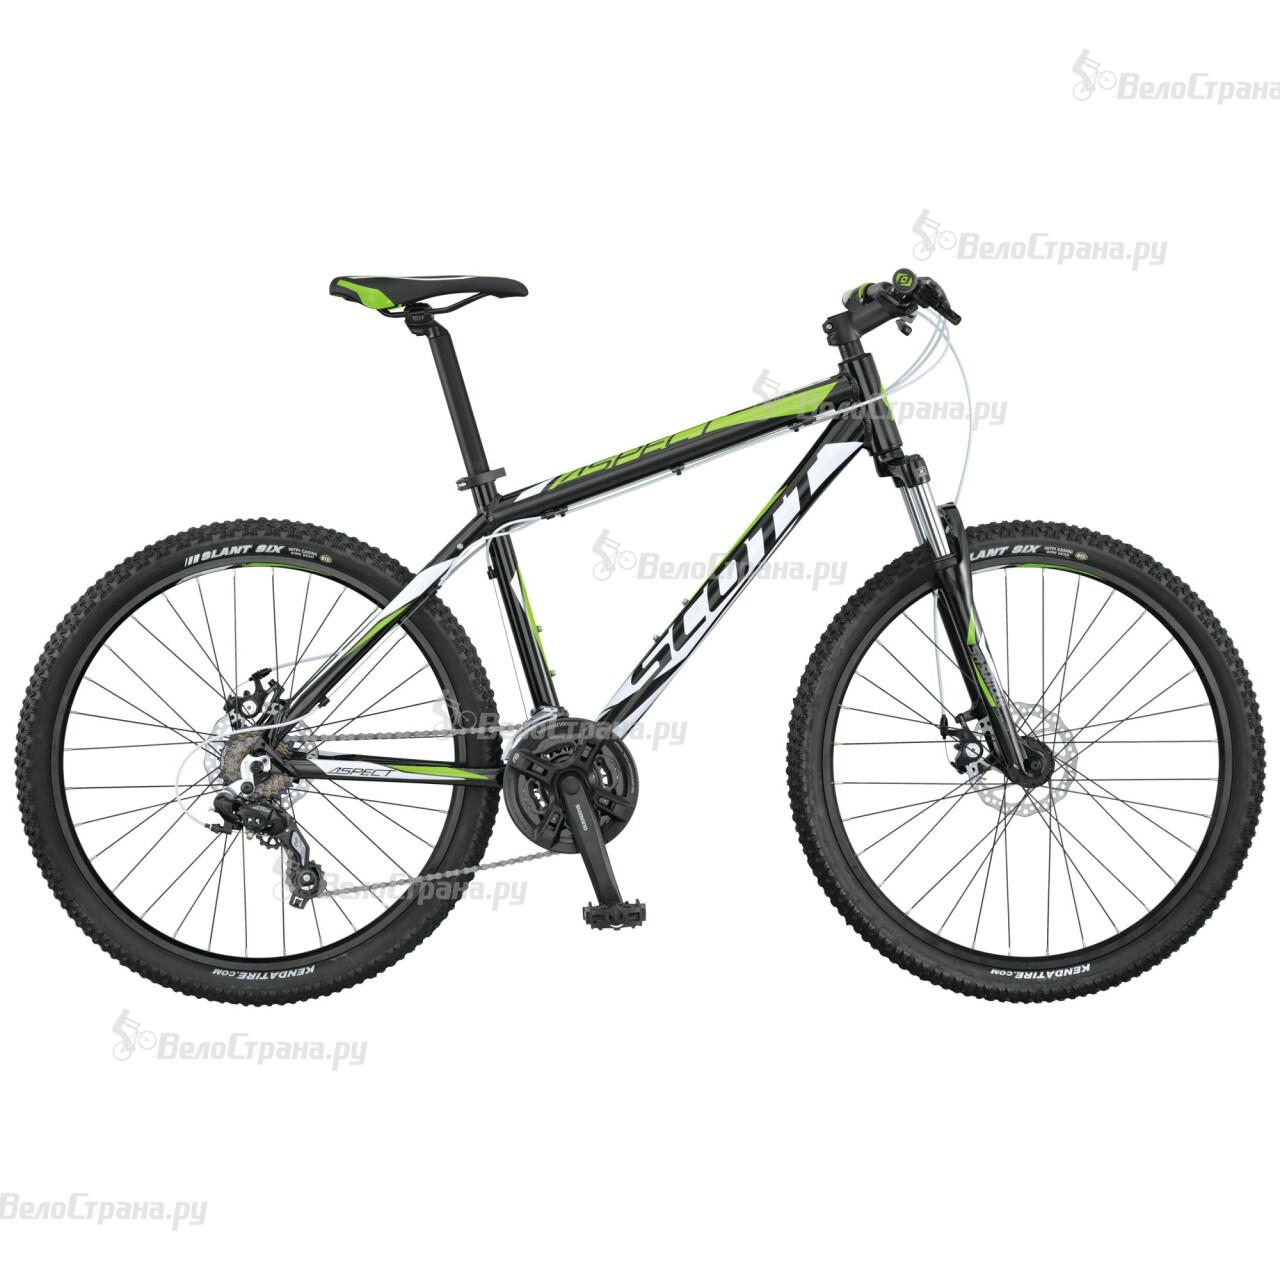 Велосипед Scott Aspect 670 (2015)